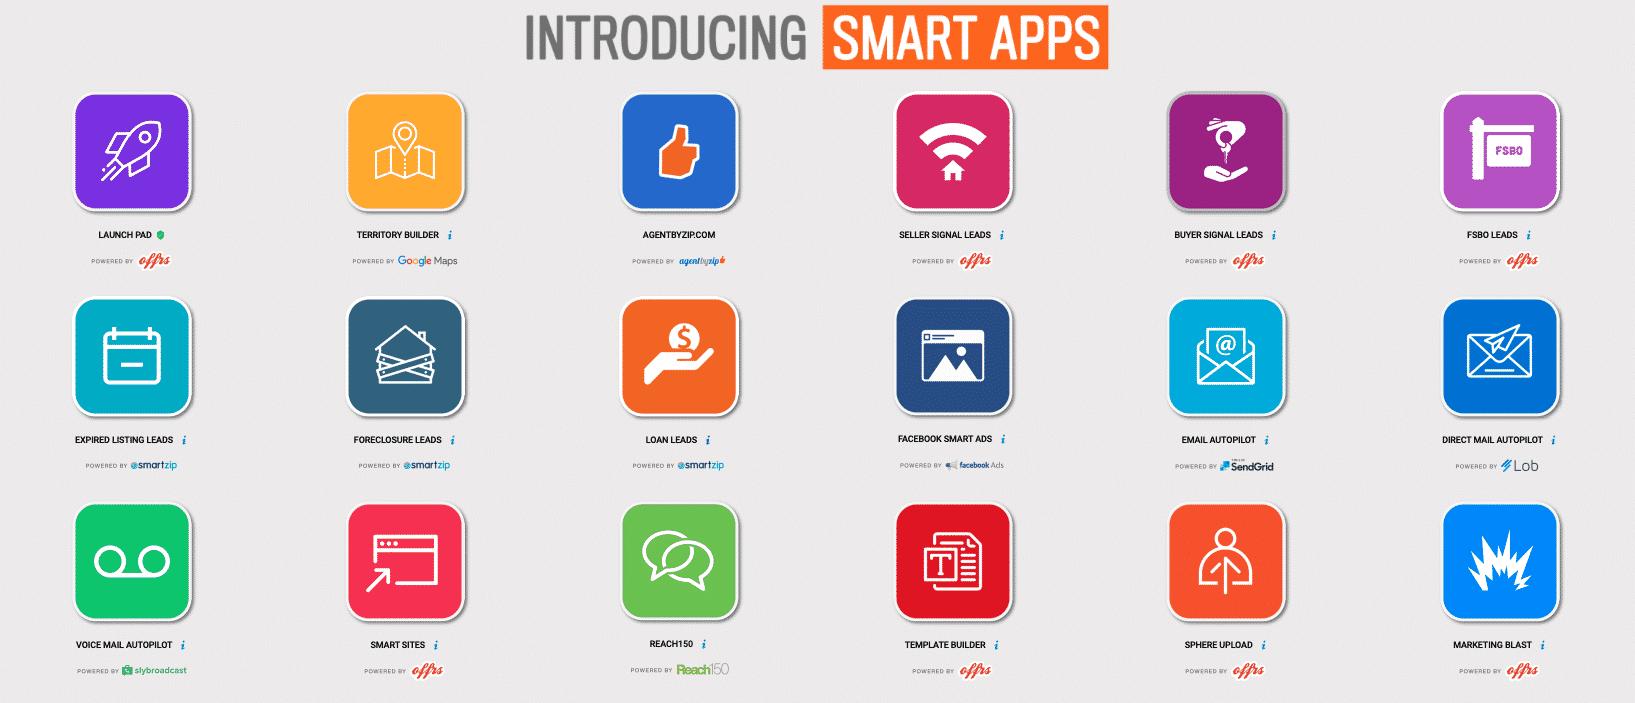 Offrs Smart Apps